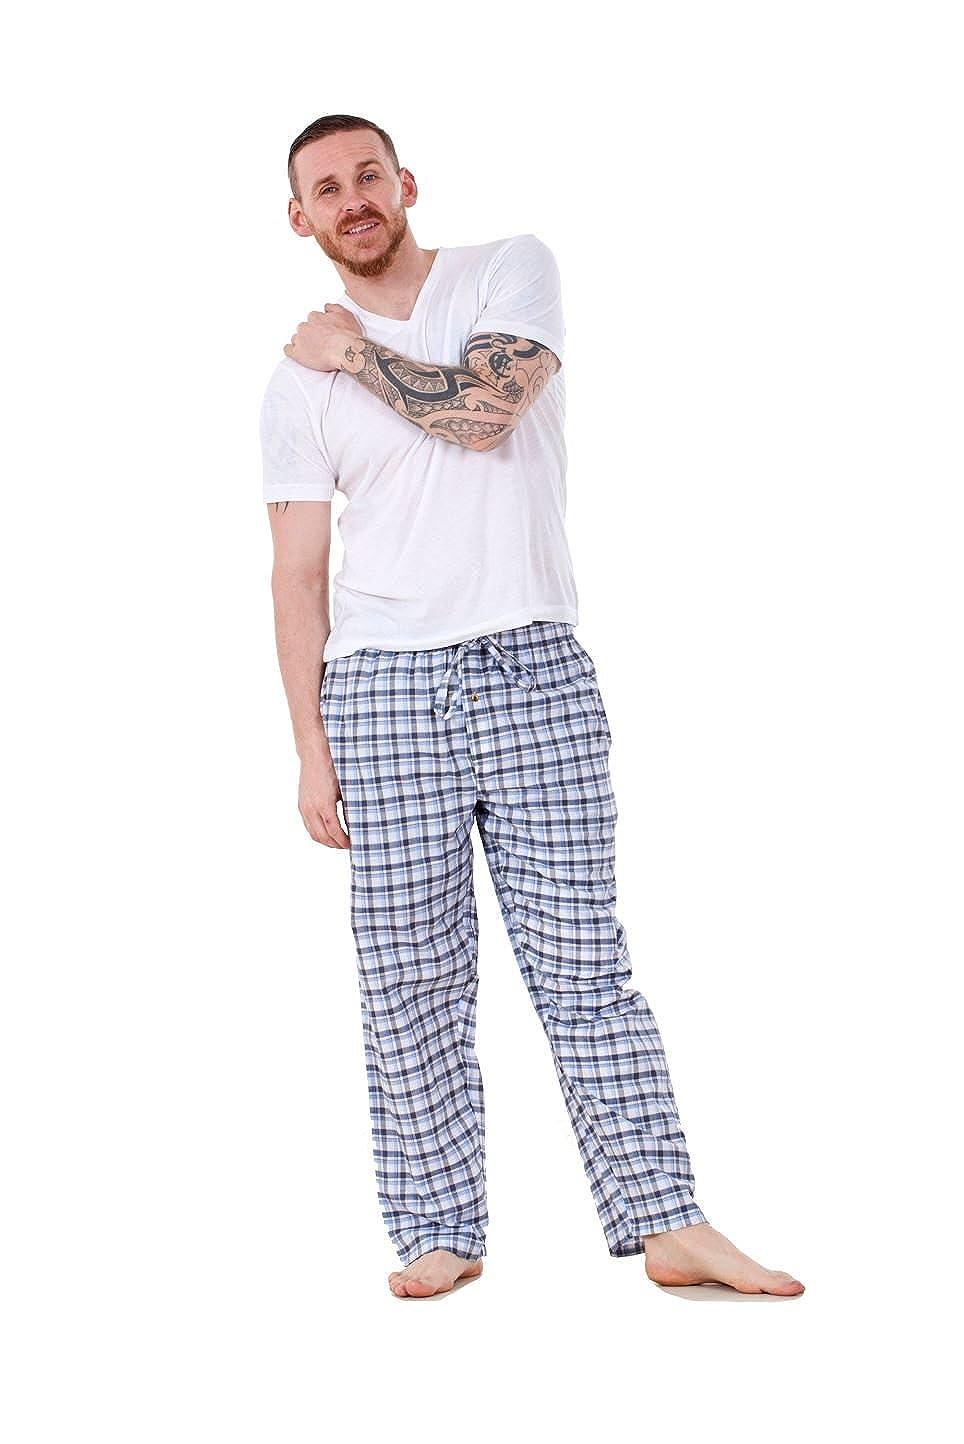 Bay eCom UK Mens Pyjama Bottoms Rich Cotton Woven Check Lounge Pant Nightwear Big 3XL to 5XL Does not Apply